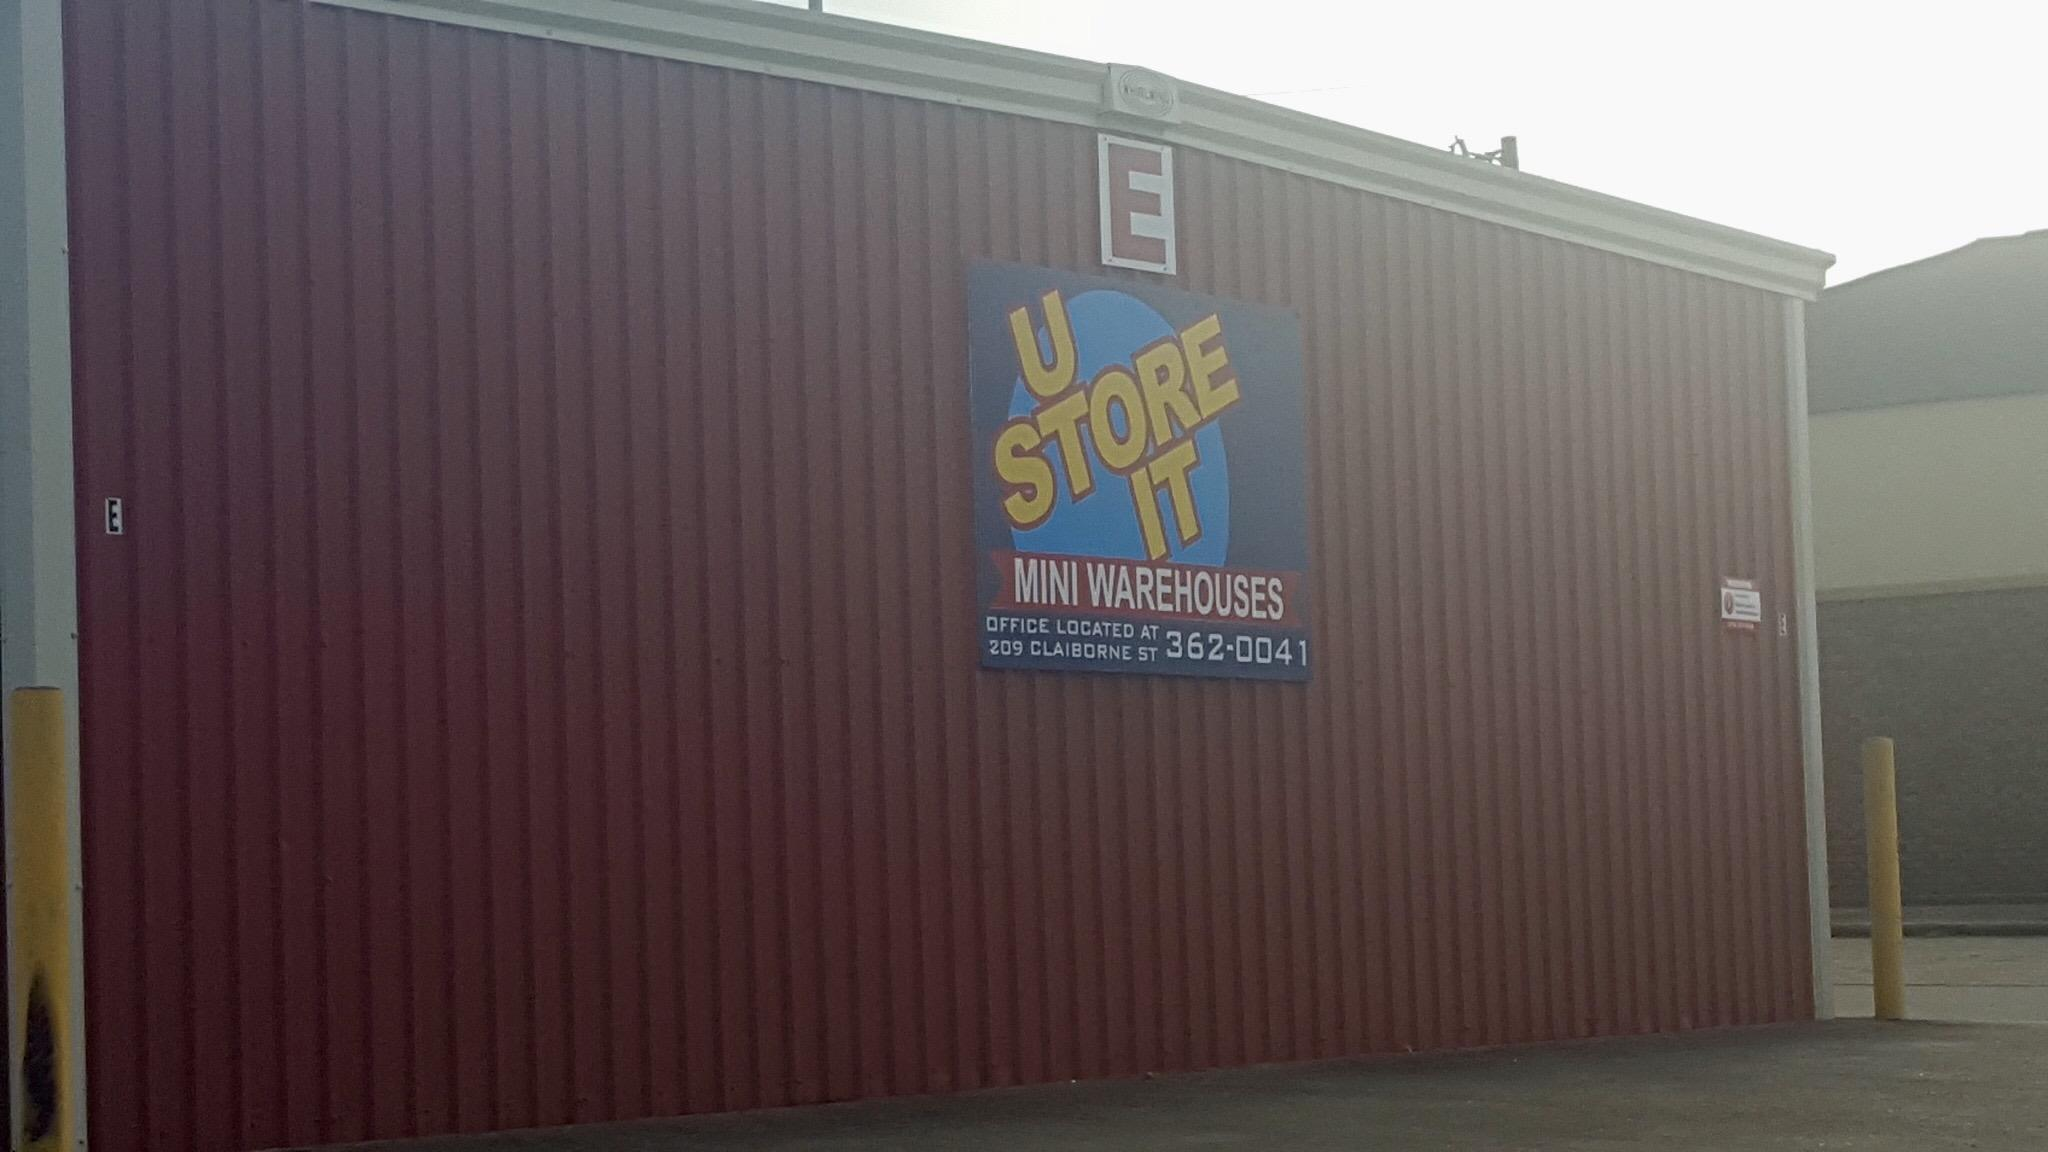 U-Store-It Warehouses image 3